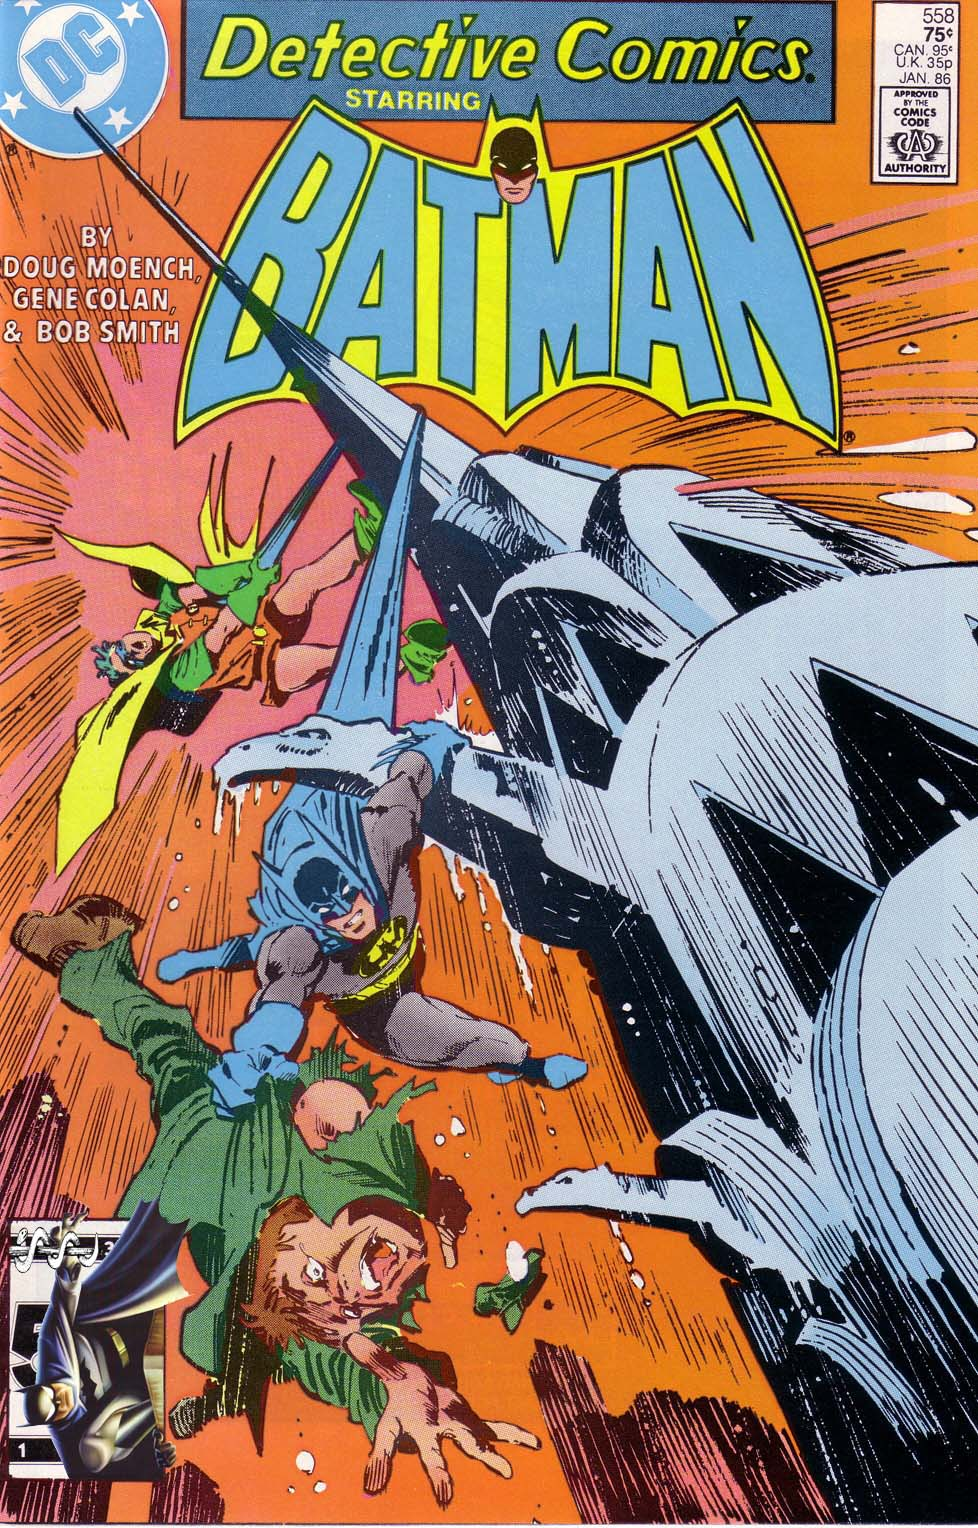 Detective Comics (1937) 558 Page 1